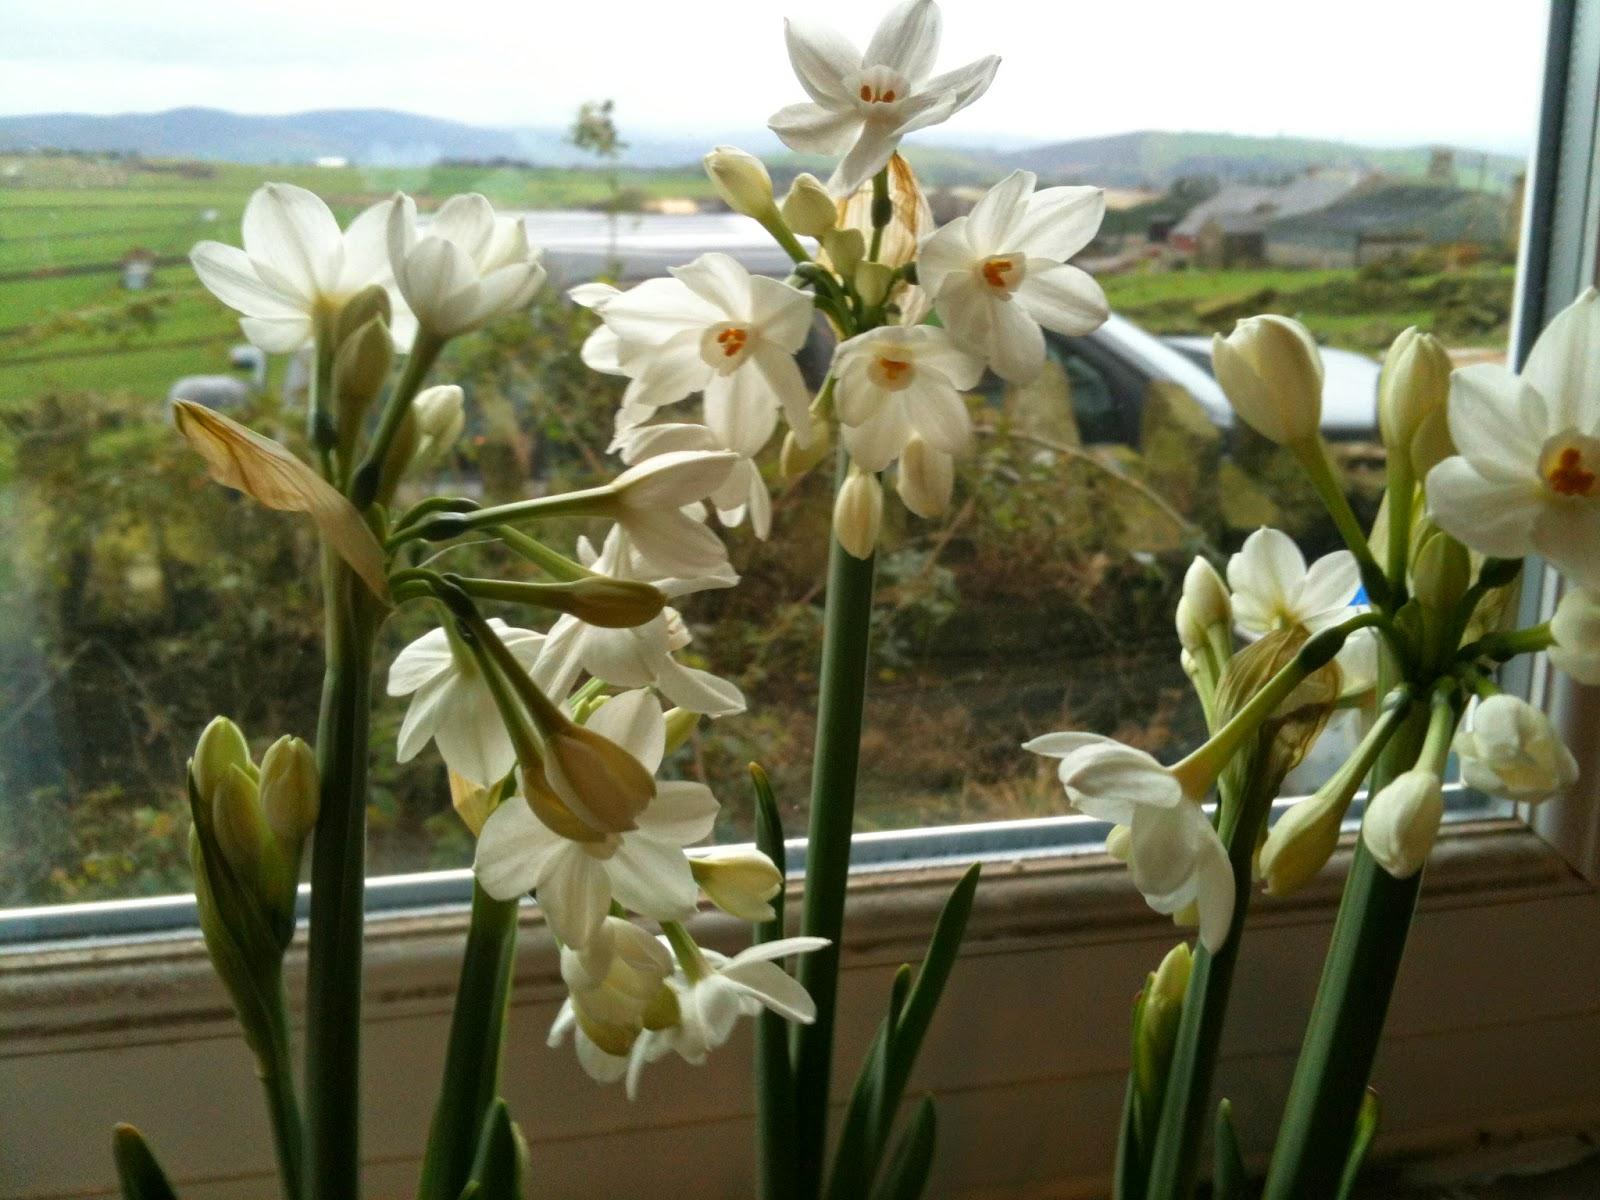 Paper Whites on the windowsill #lifeonpigrow